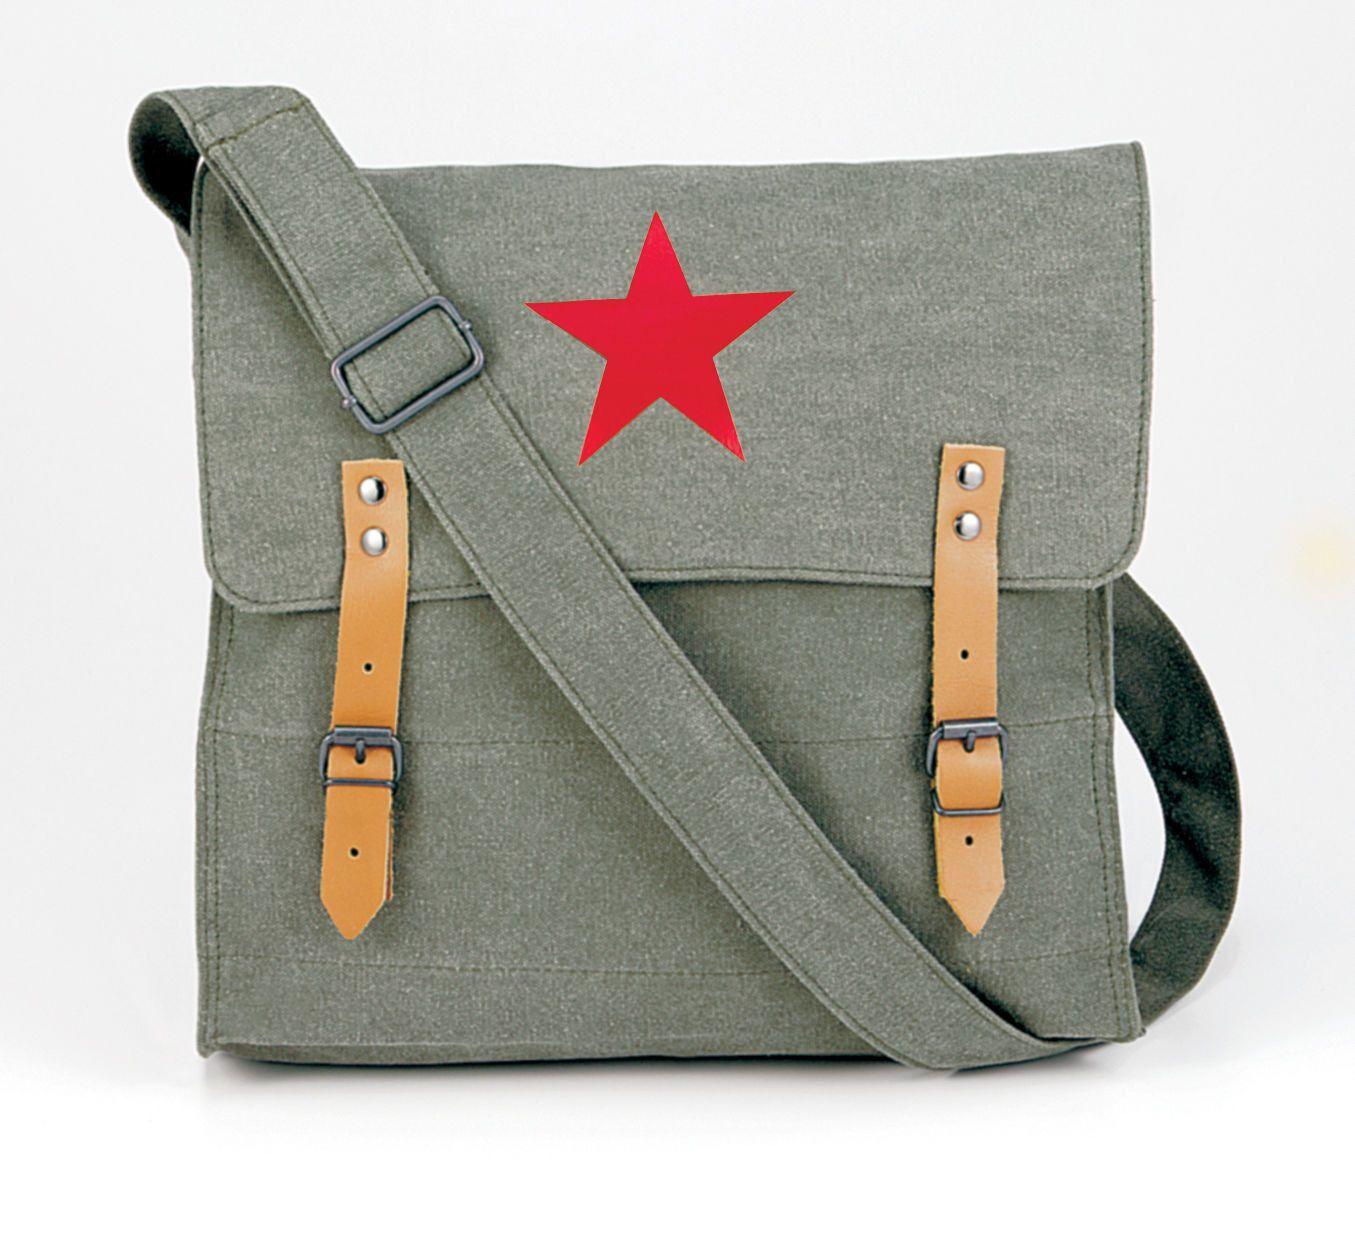 Vintage Canvas Messenger Bags Stylish Medic Shoulder W Leather Straps